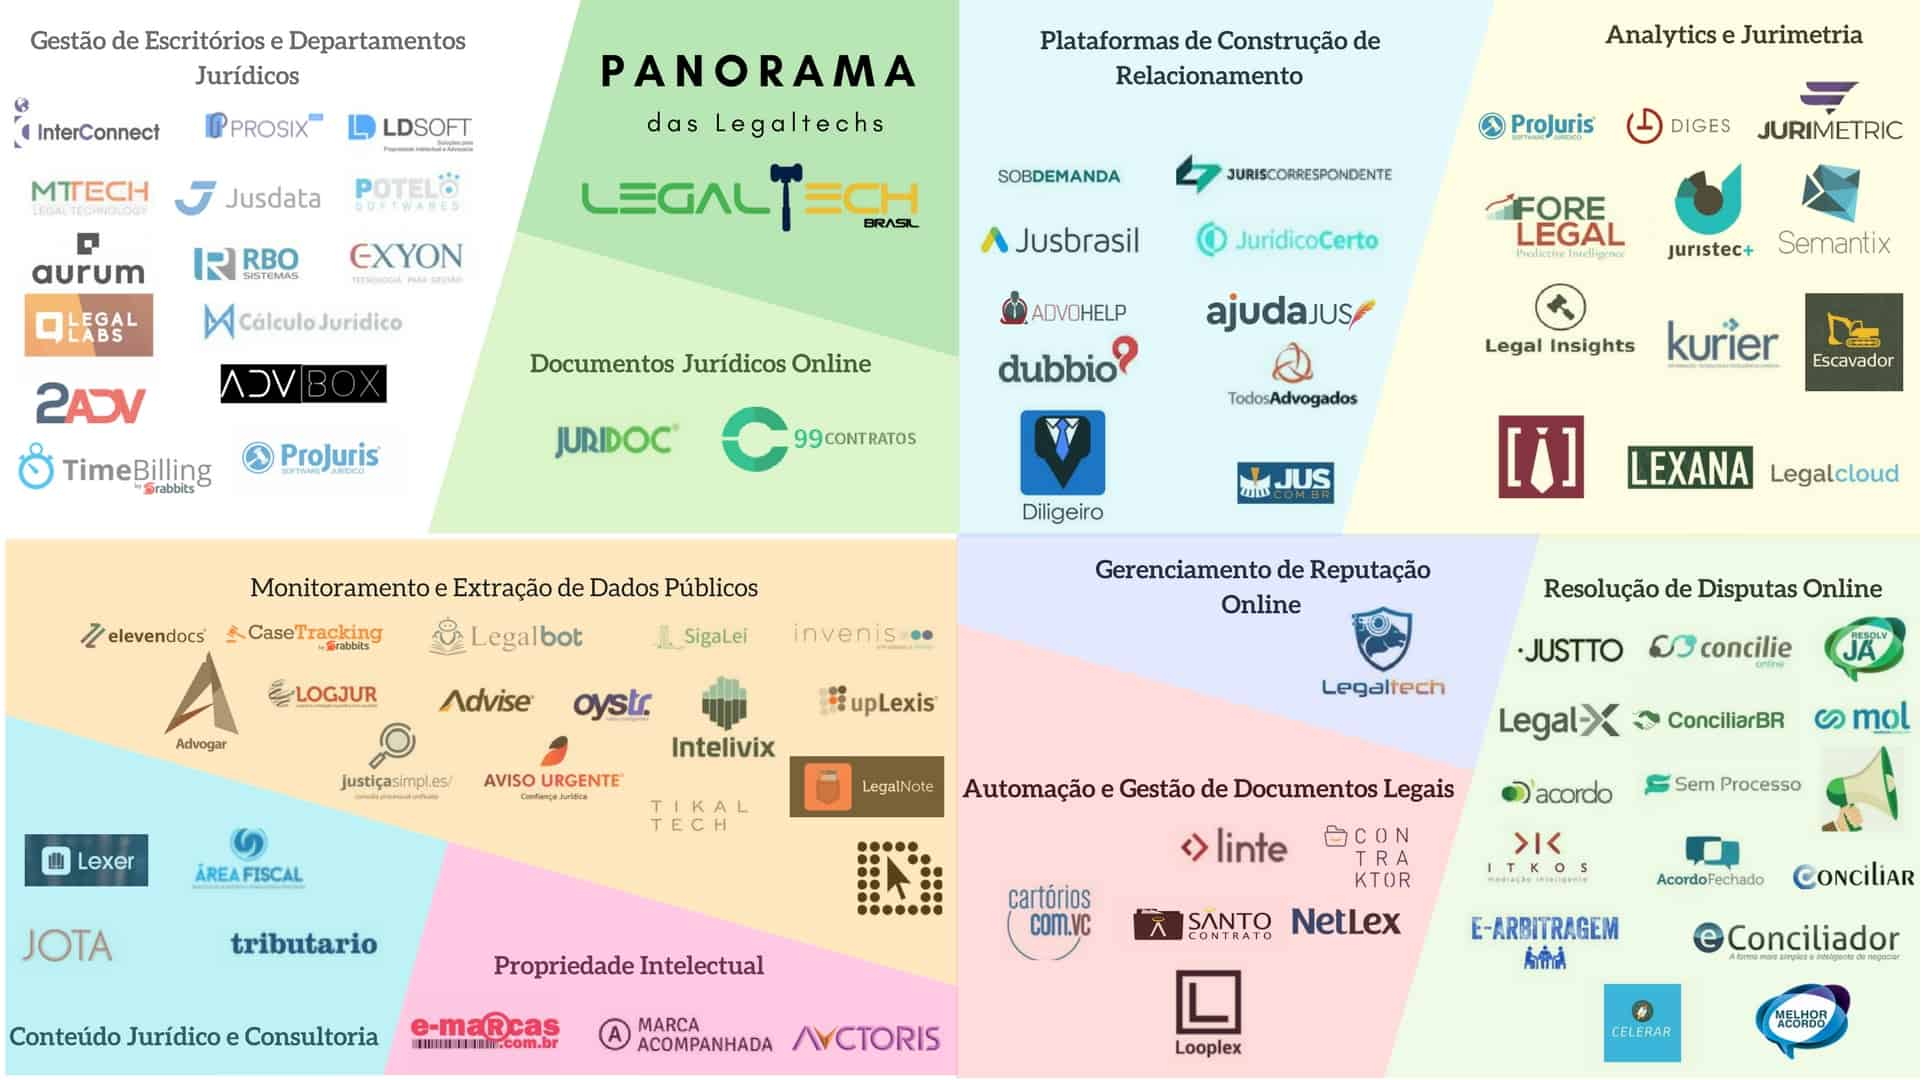 Mosaico da Legaltech no brasil mostra que há mais de 80 Legaltechs no Brasil